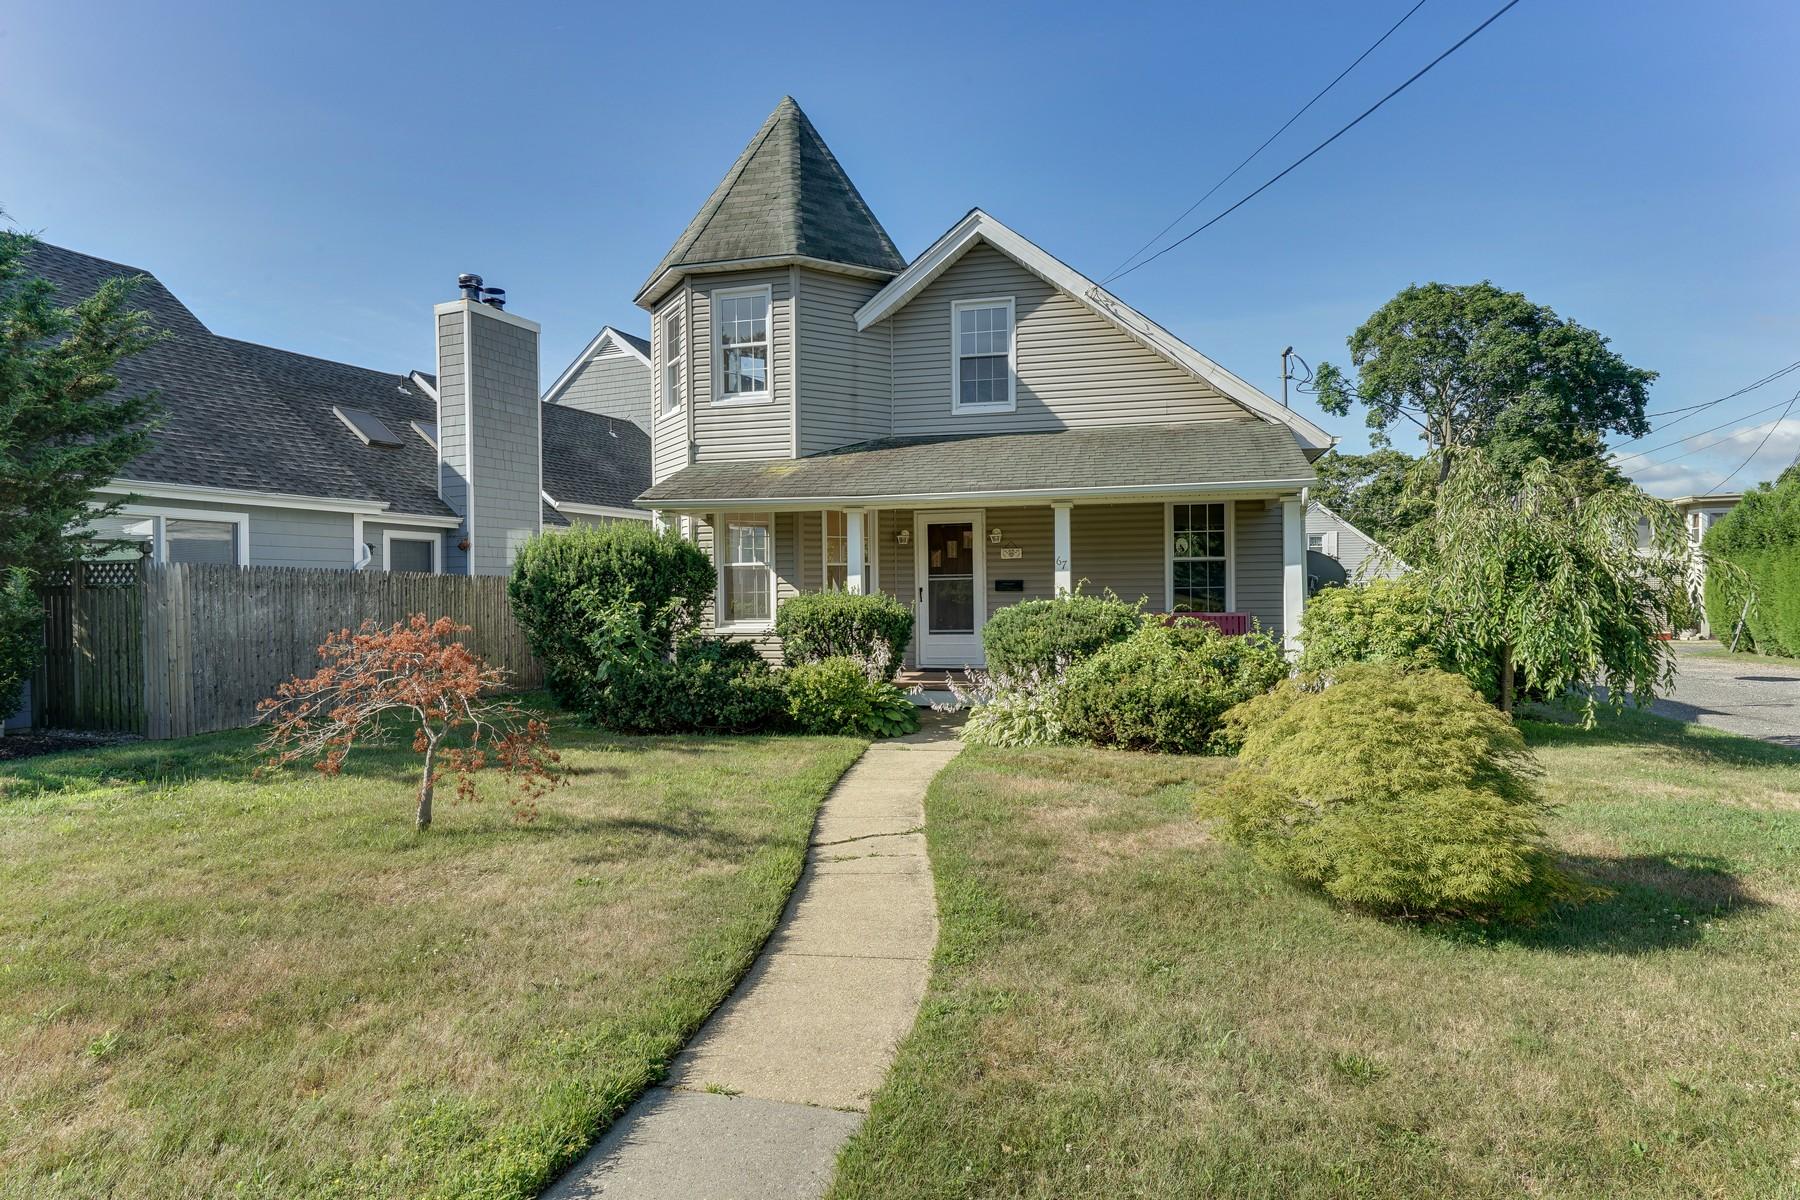 多户住宅 为 销售 在 Two Family House 67-67 12 Sea Girt Ave Manasquan, 新泽西州, 08736 美国